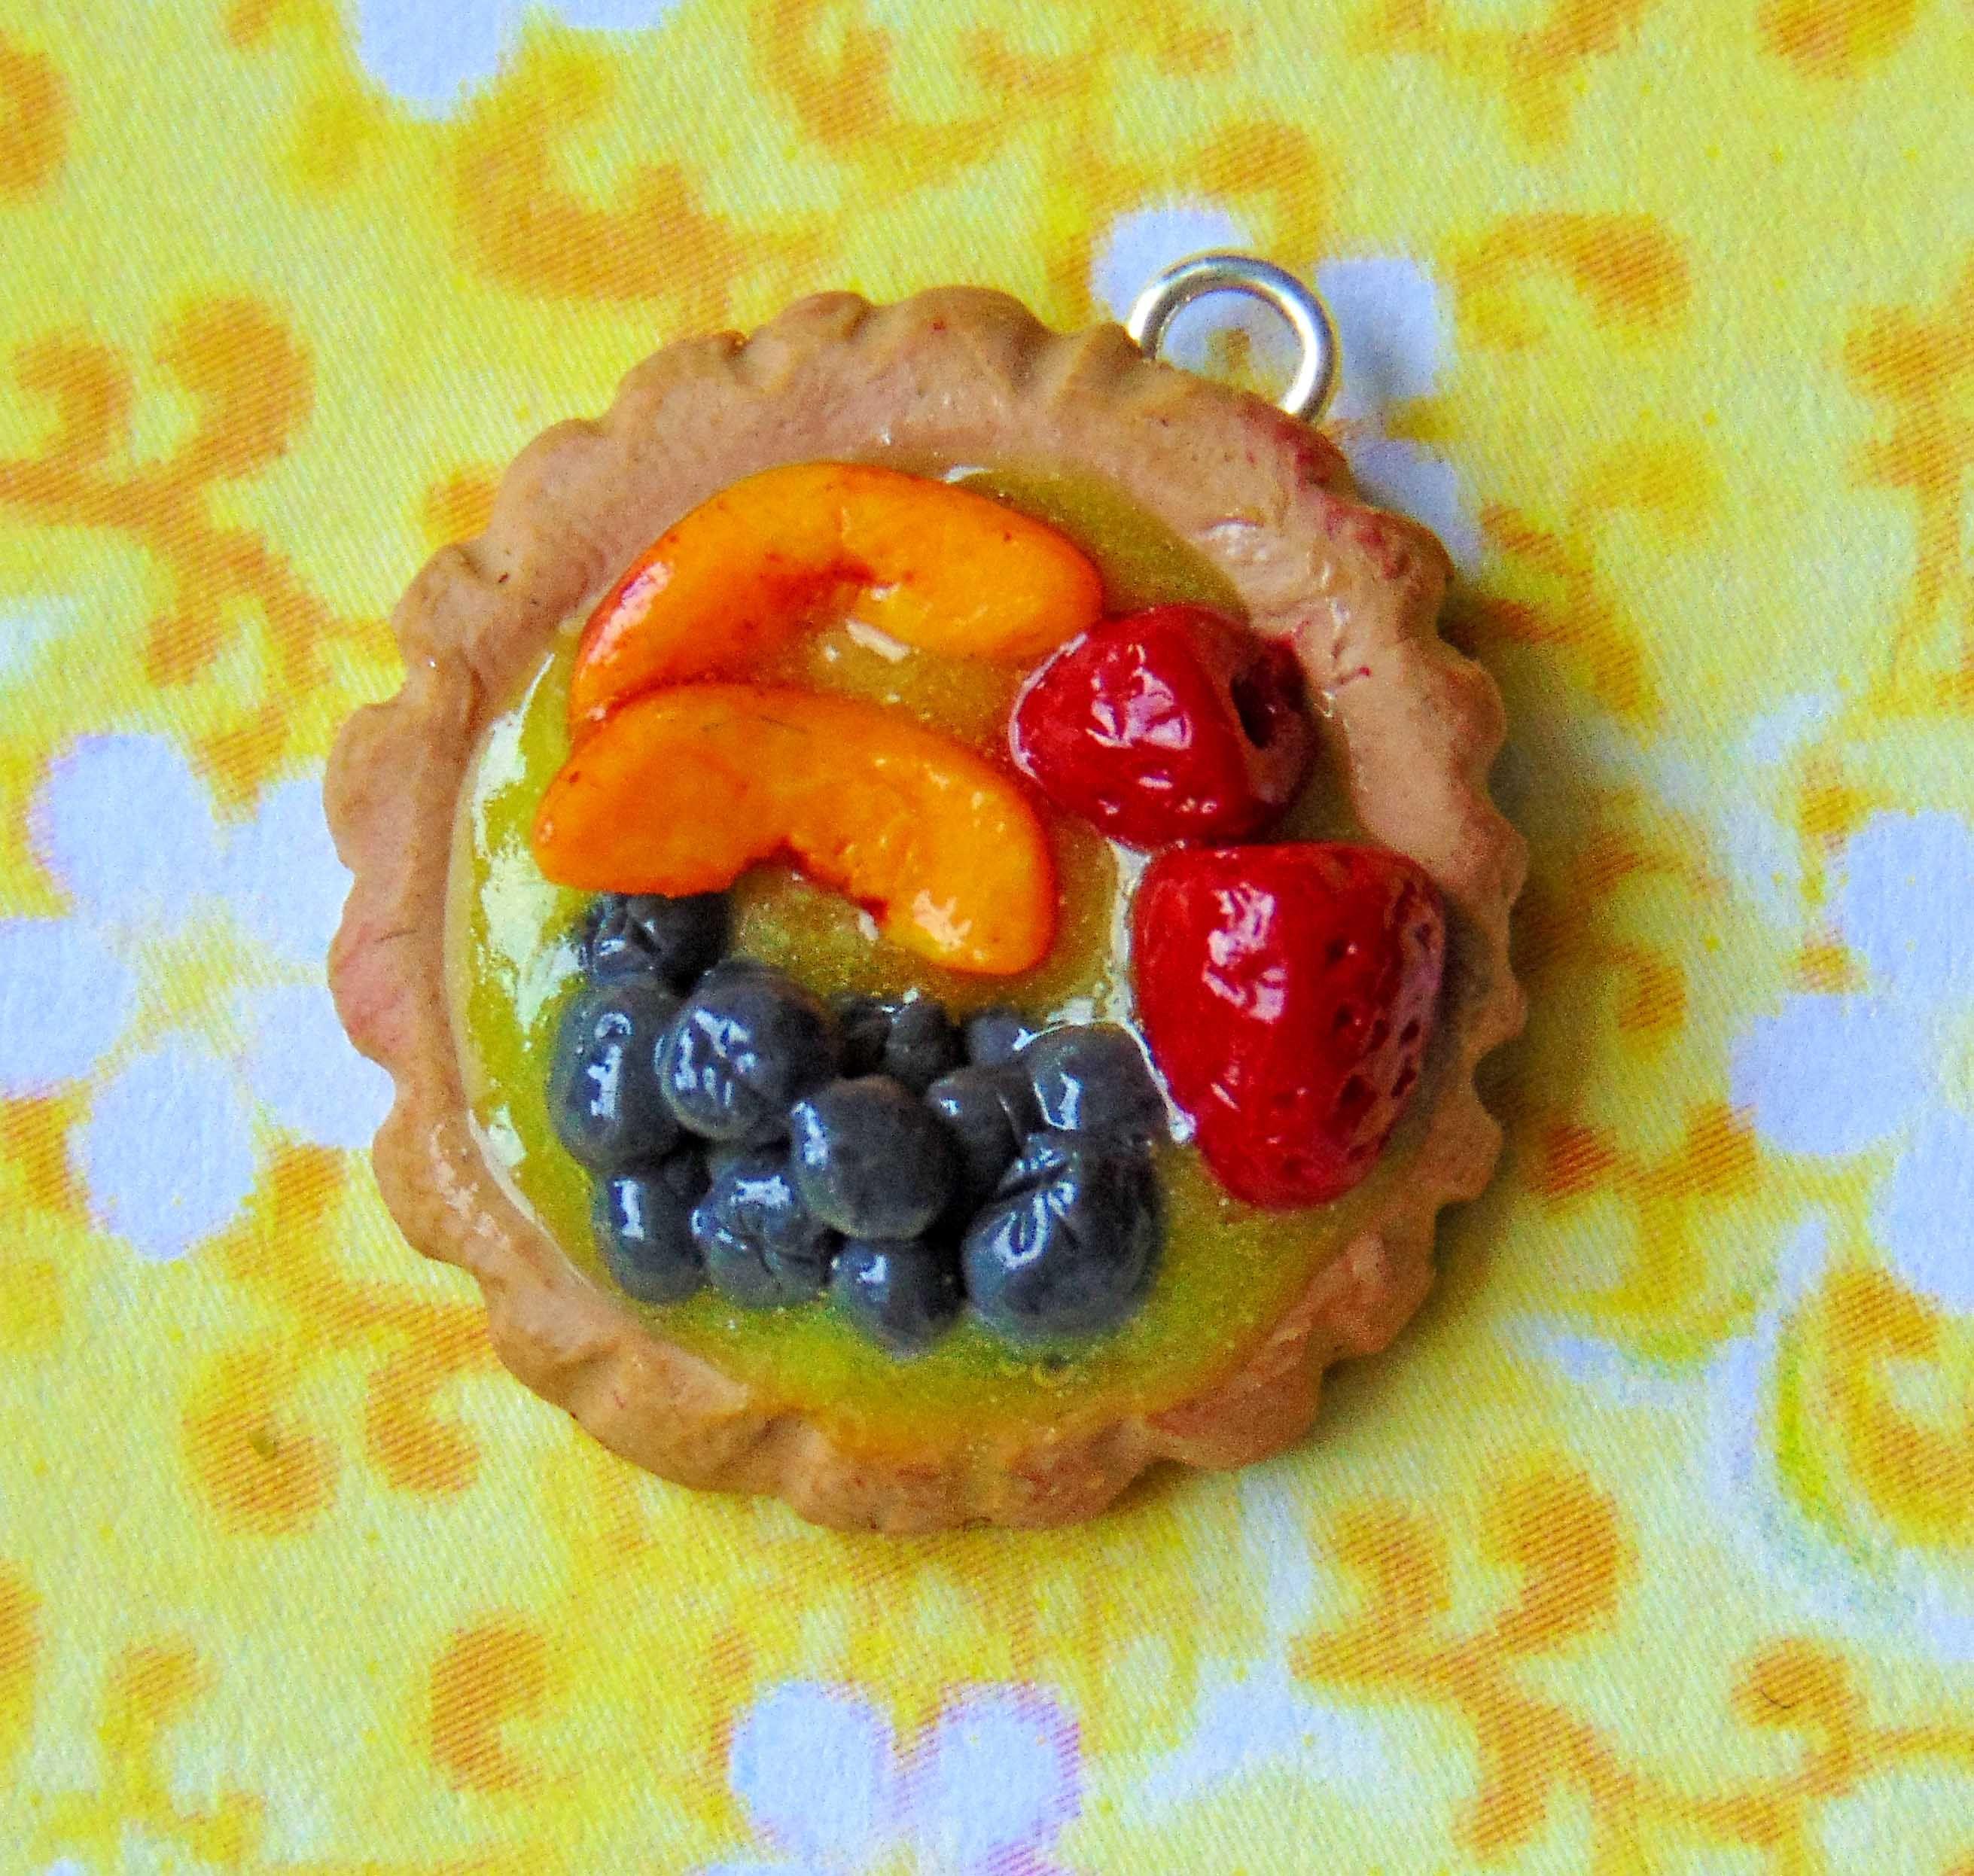 blueberry tart peach strawberry pie charm pendant cute fruit food sculpture polymer lemon clay cream sculpey